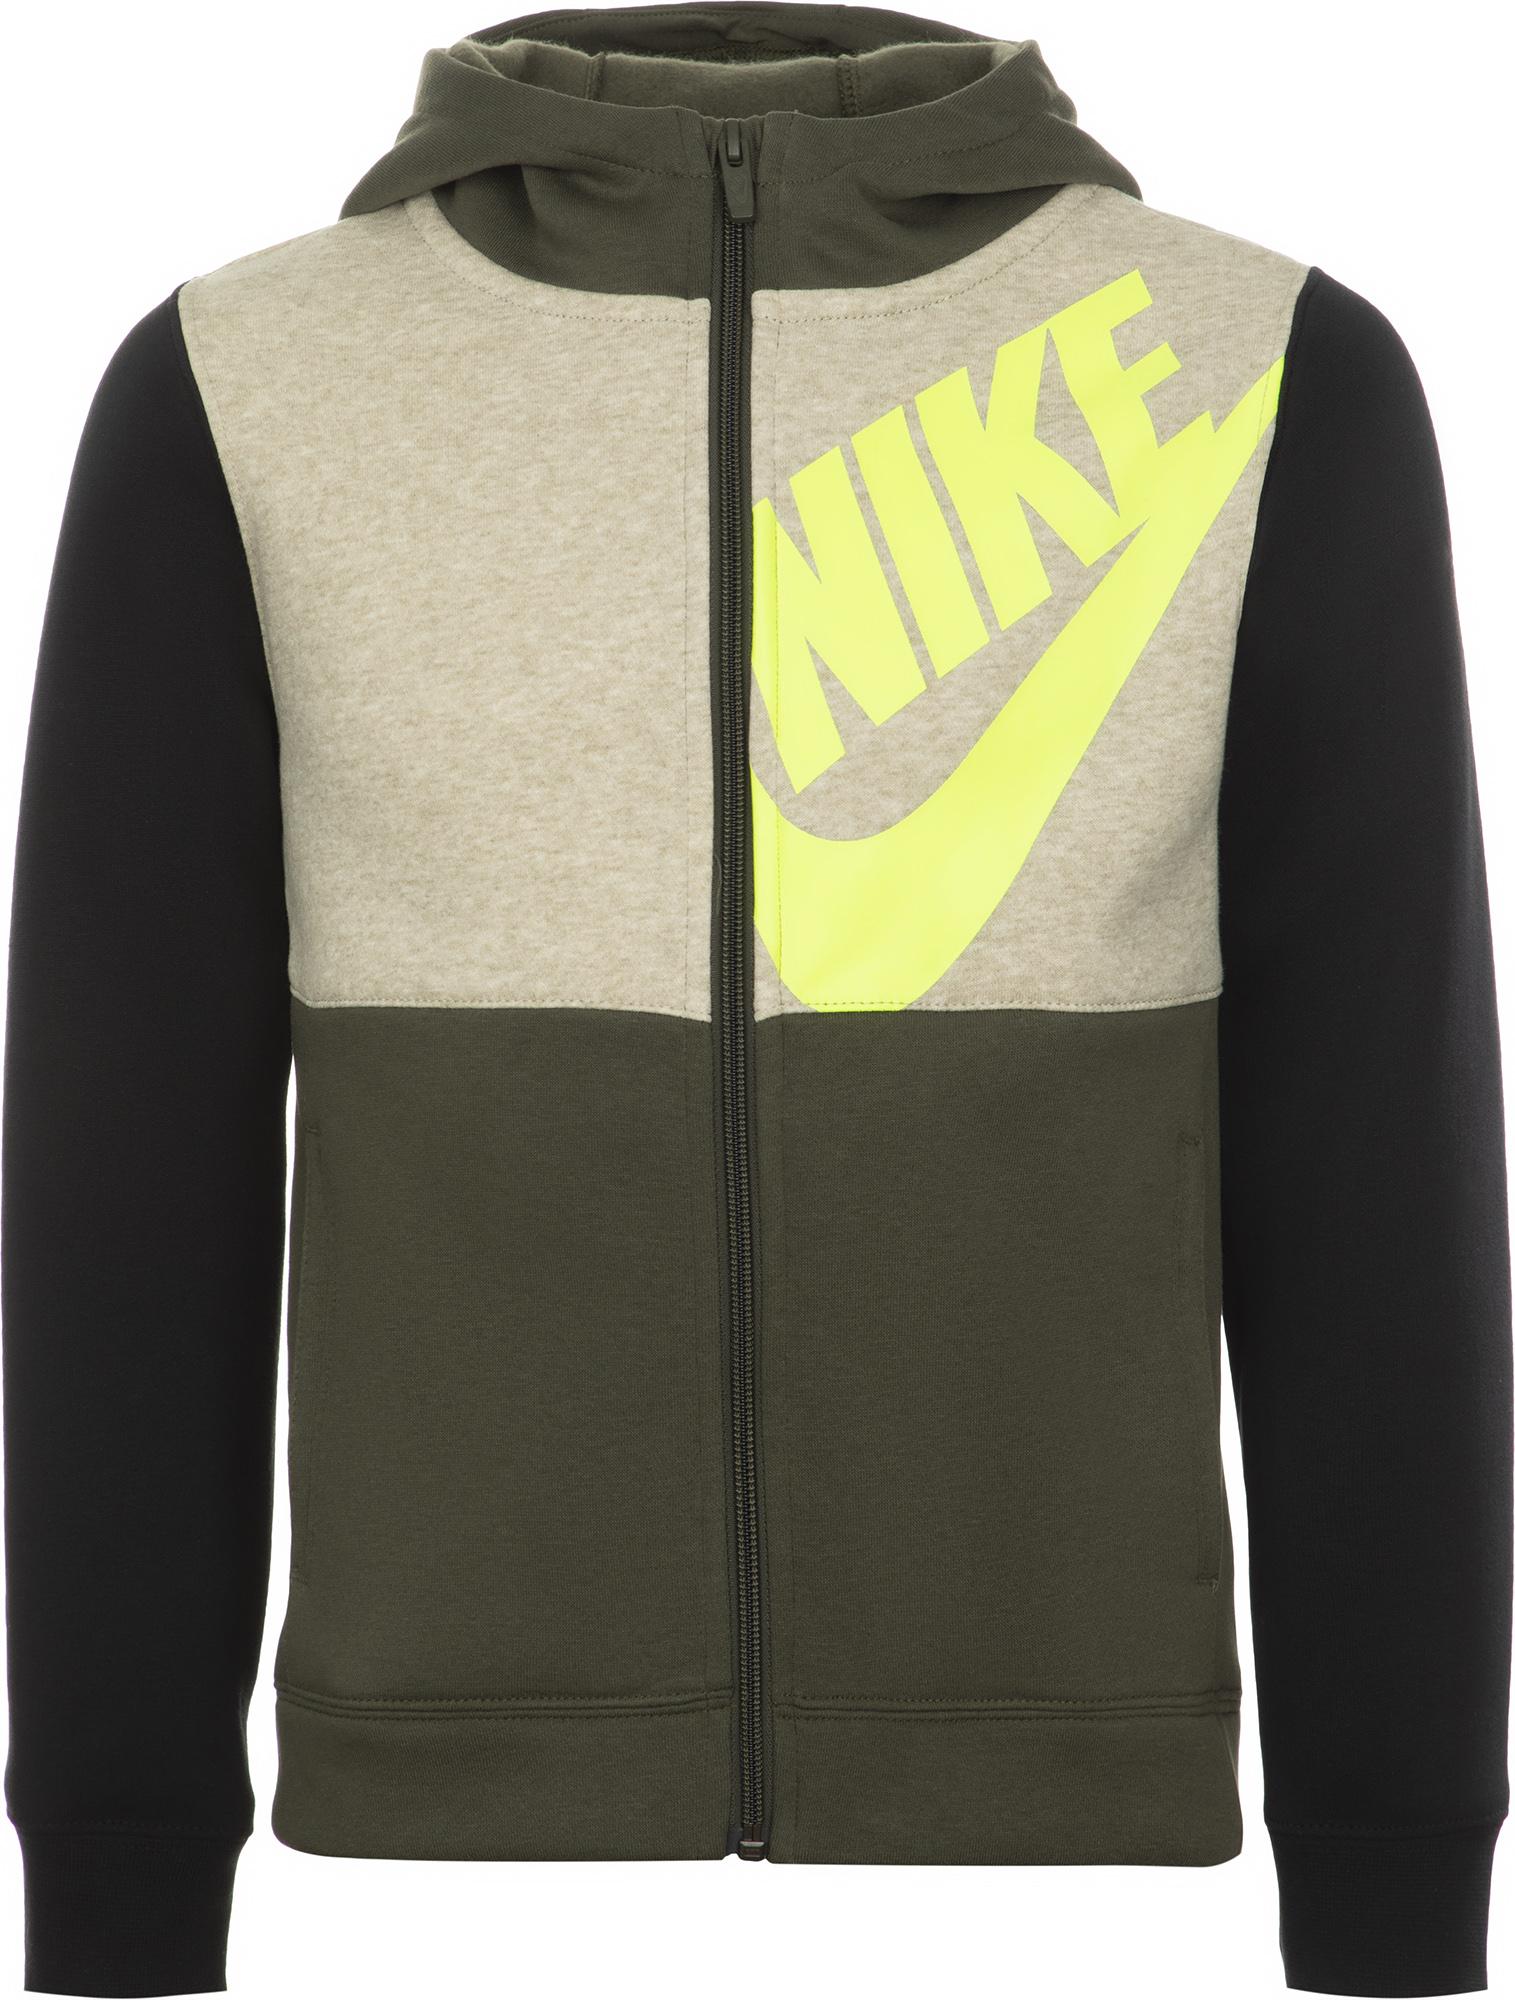 Nike Толстовка для мальчиков Nike Sportswear, размер 147-158